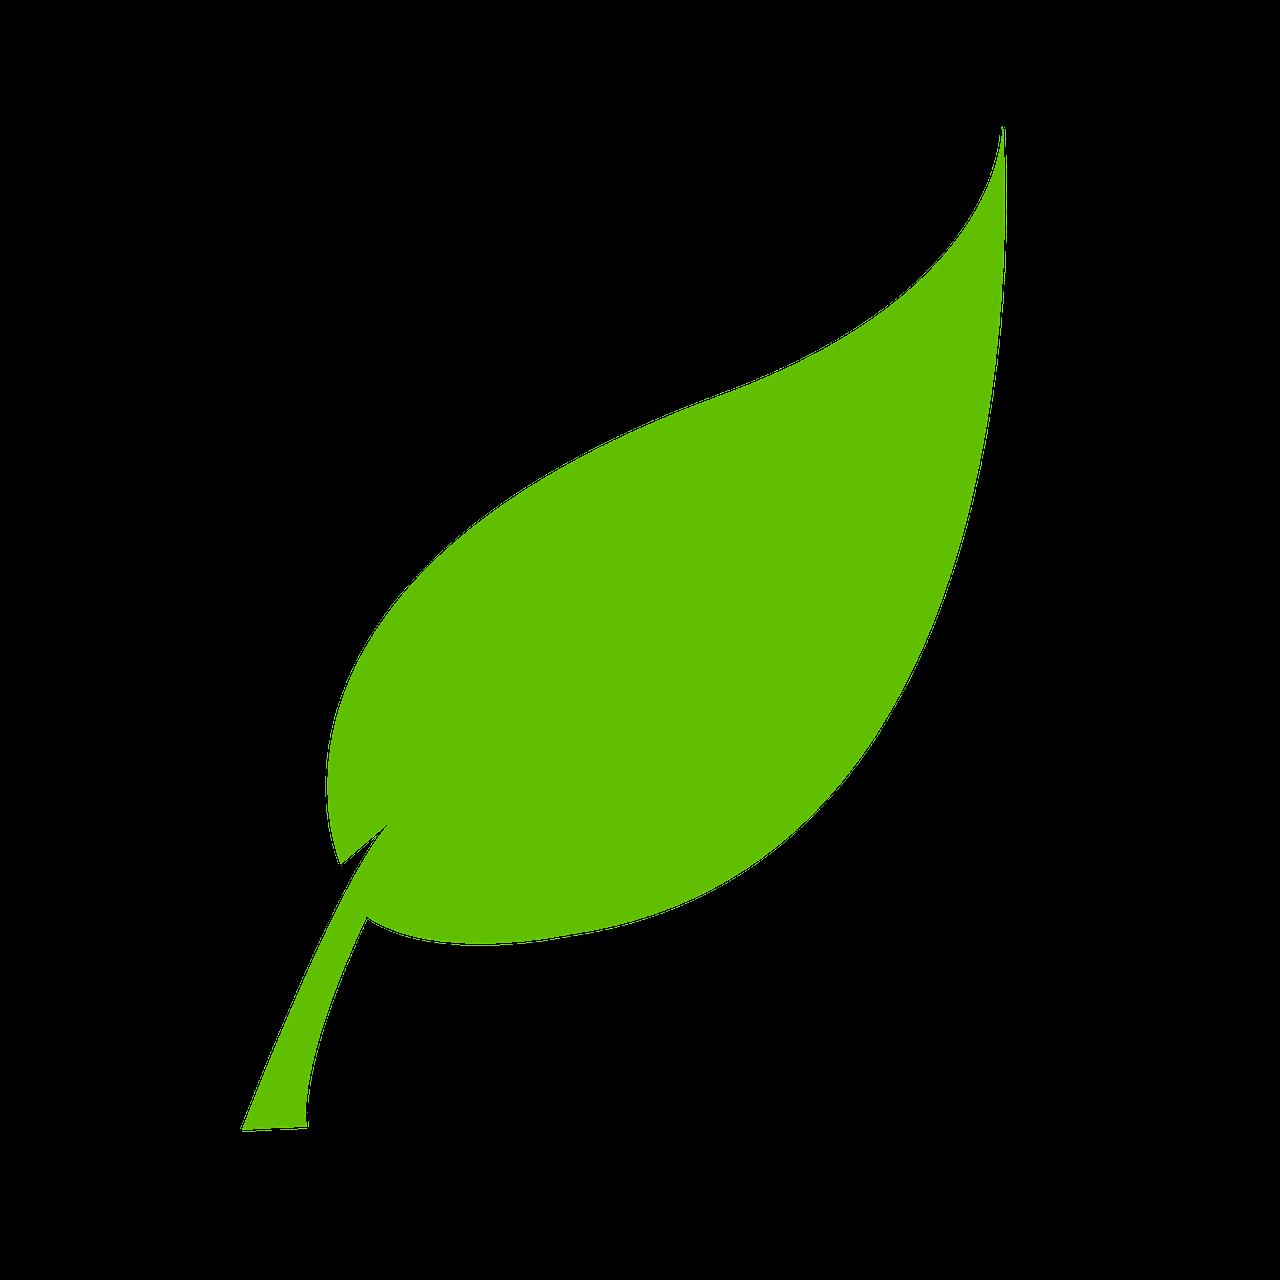 leaf-310555_1280.png?1622722371316